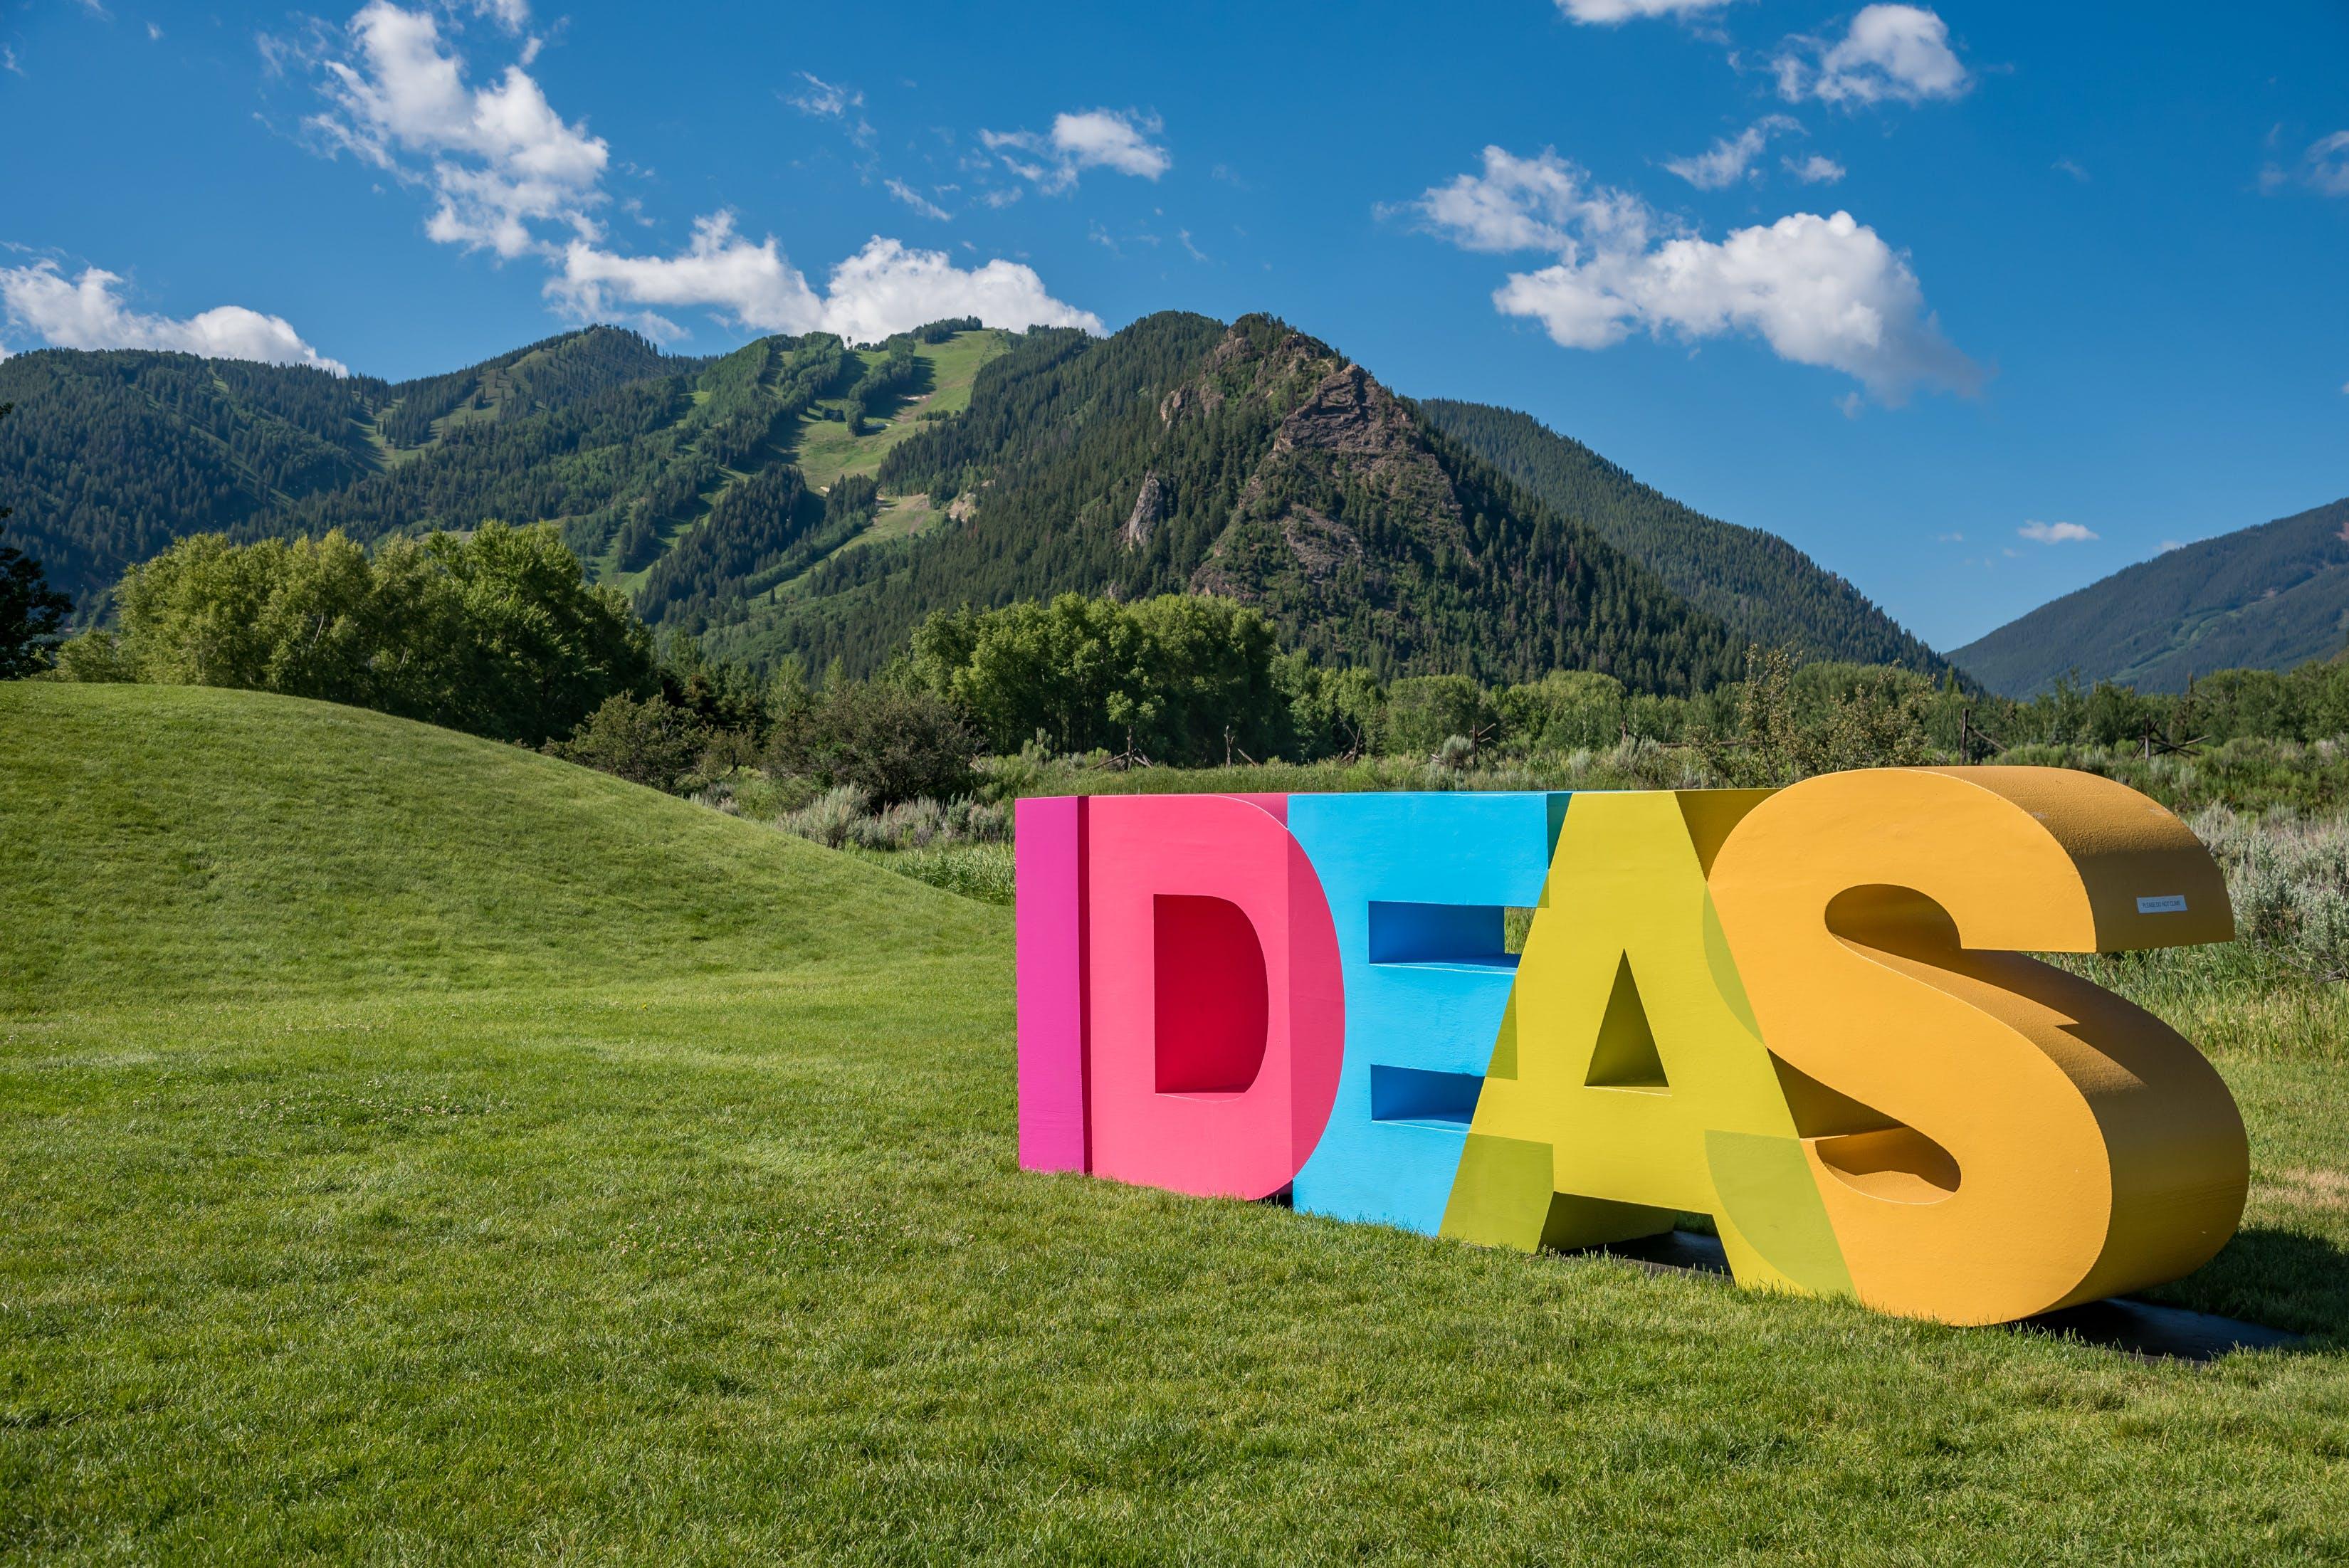 IDEAS sculpture